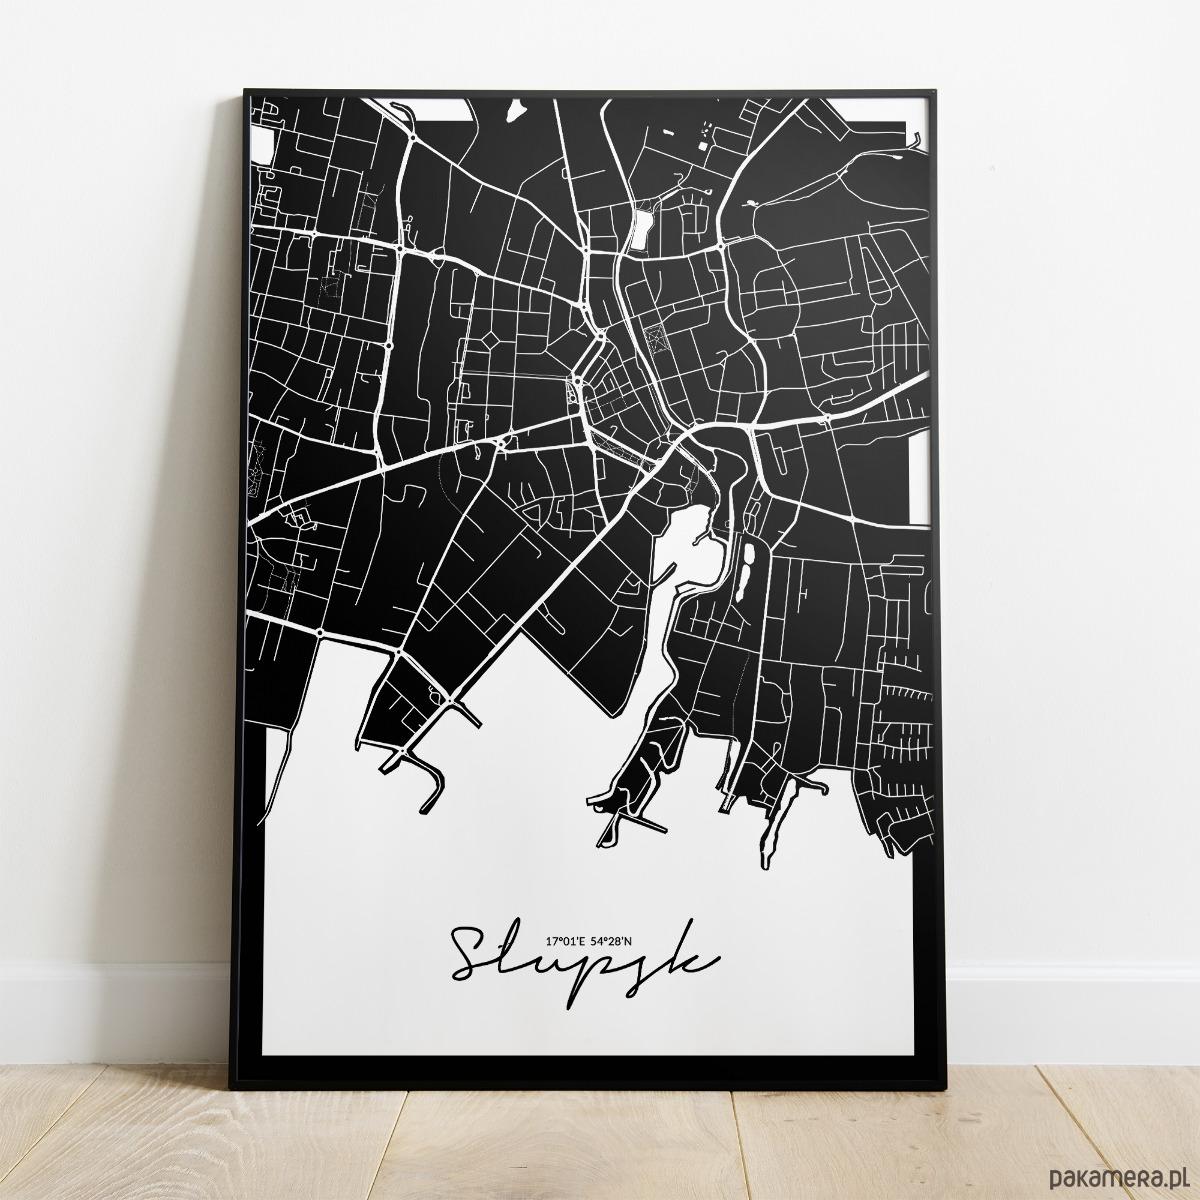 Plakat Slupsk Mapa Plakaty Pakamera Pl